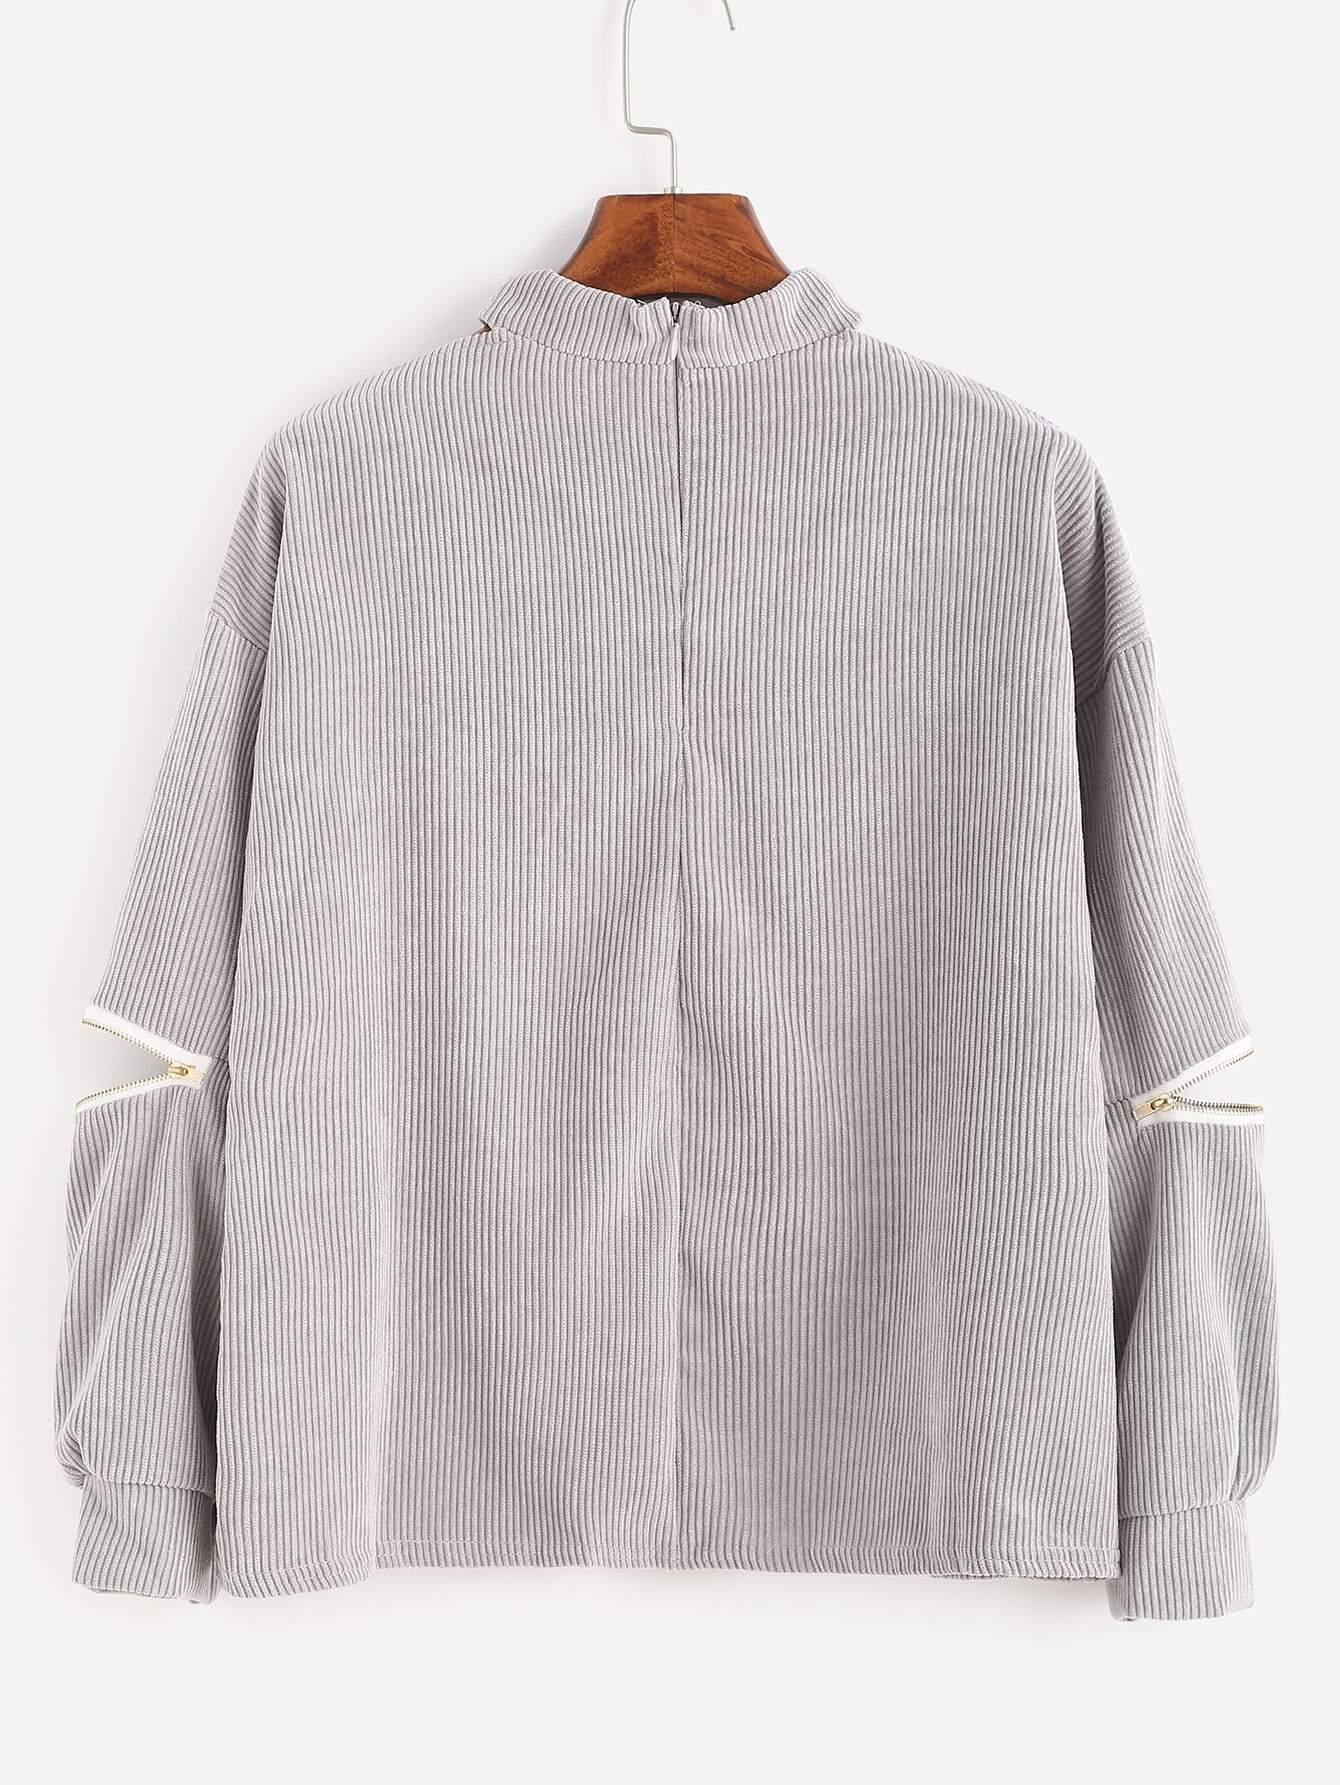 blouse160923002_2